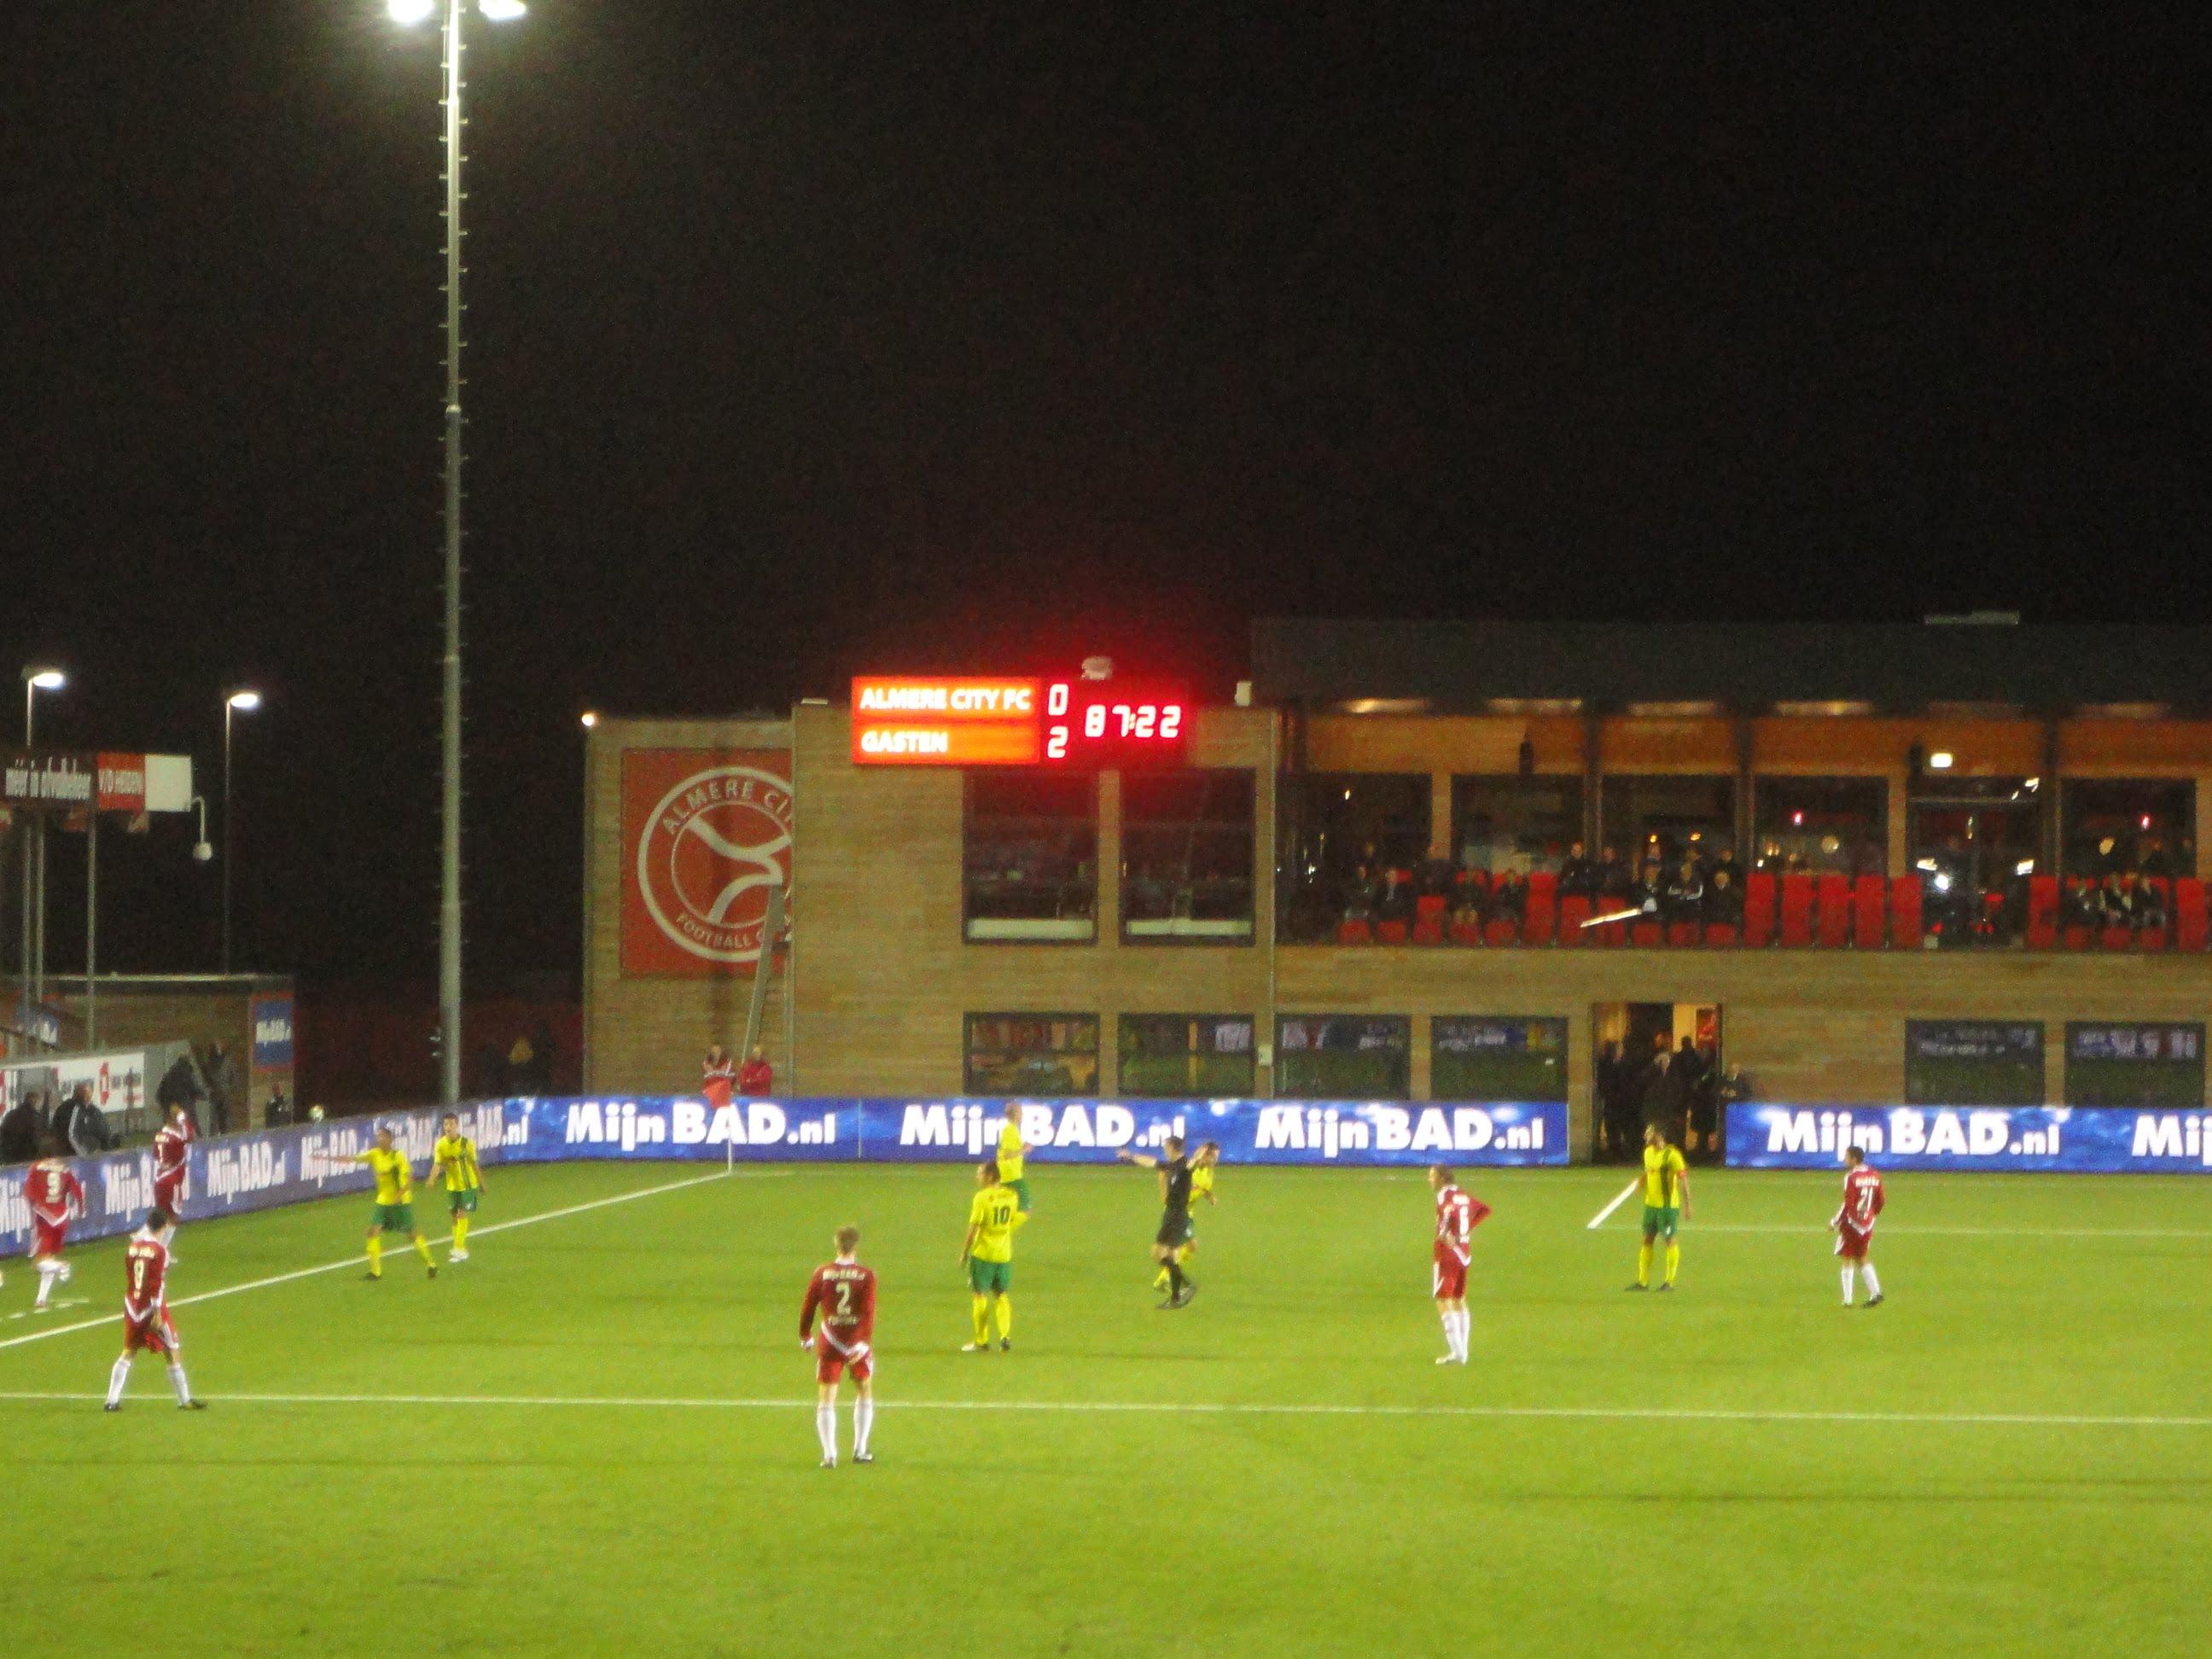 Almere City 0 Fortuna Sittard 2